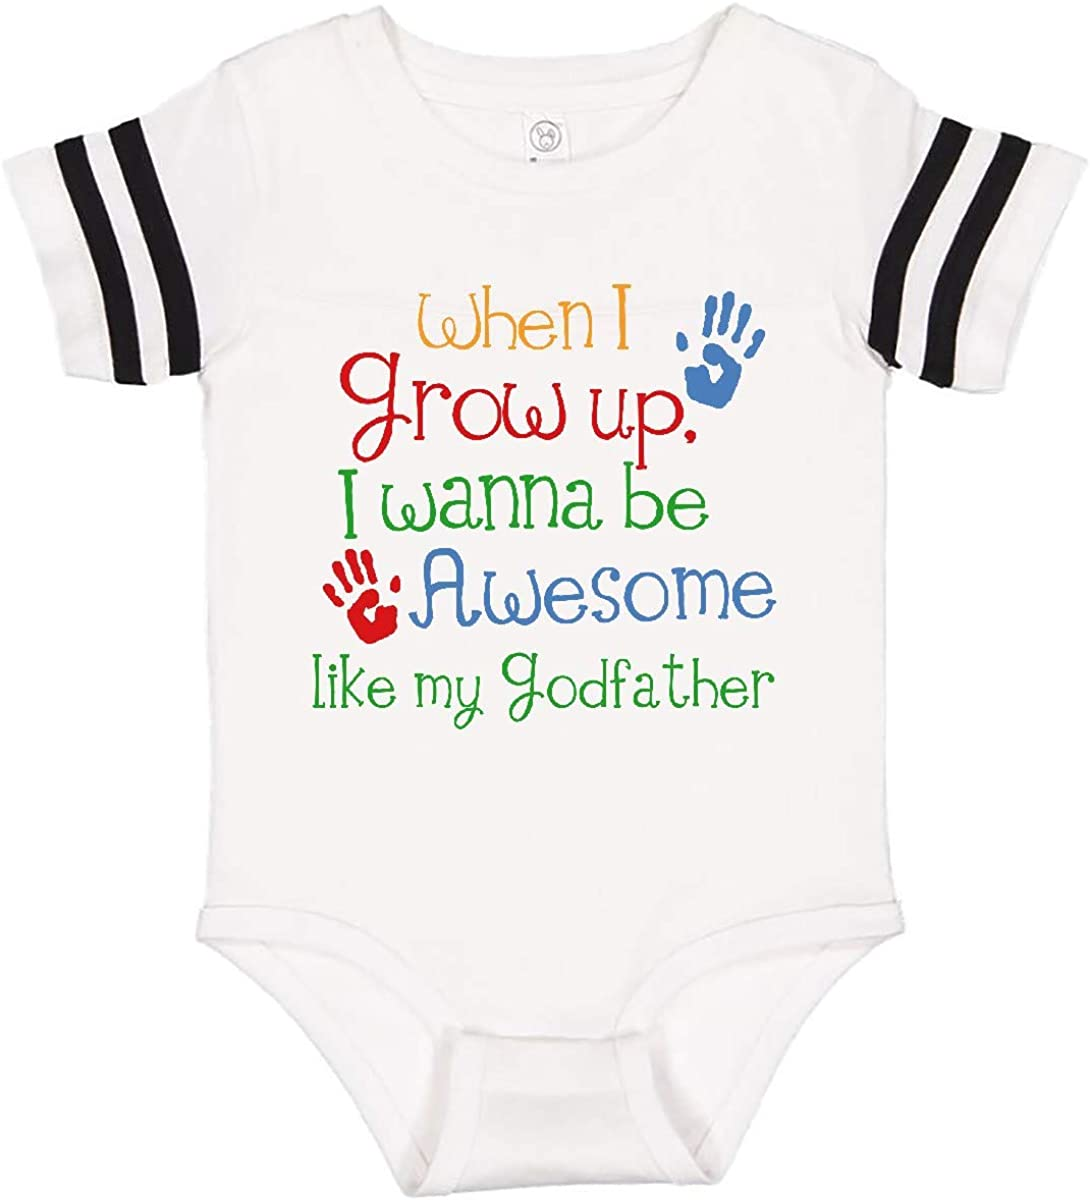 CERTONGCXTS Baby Boys Kids American Grown Argentina Roots Cute Short Sleeve T-Shirt Size 2-6